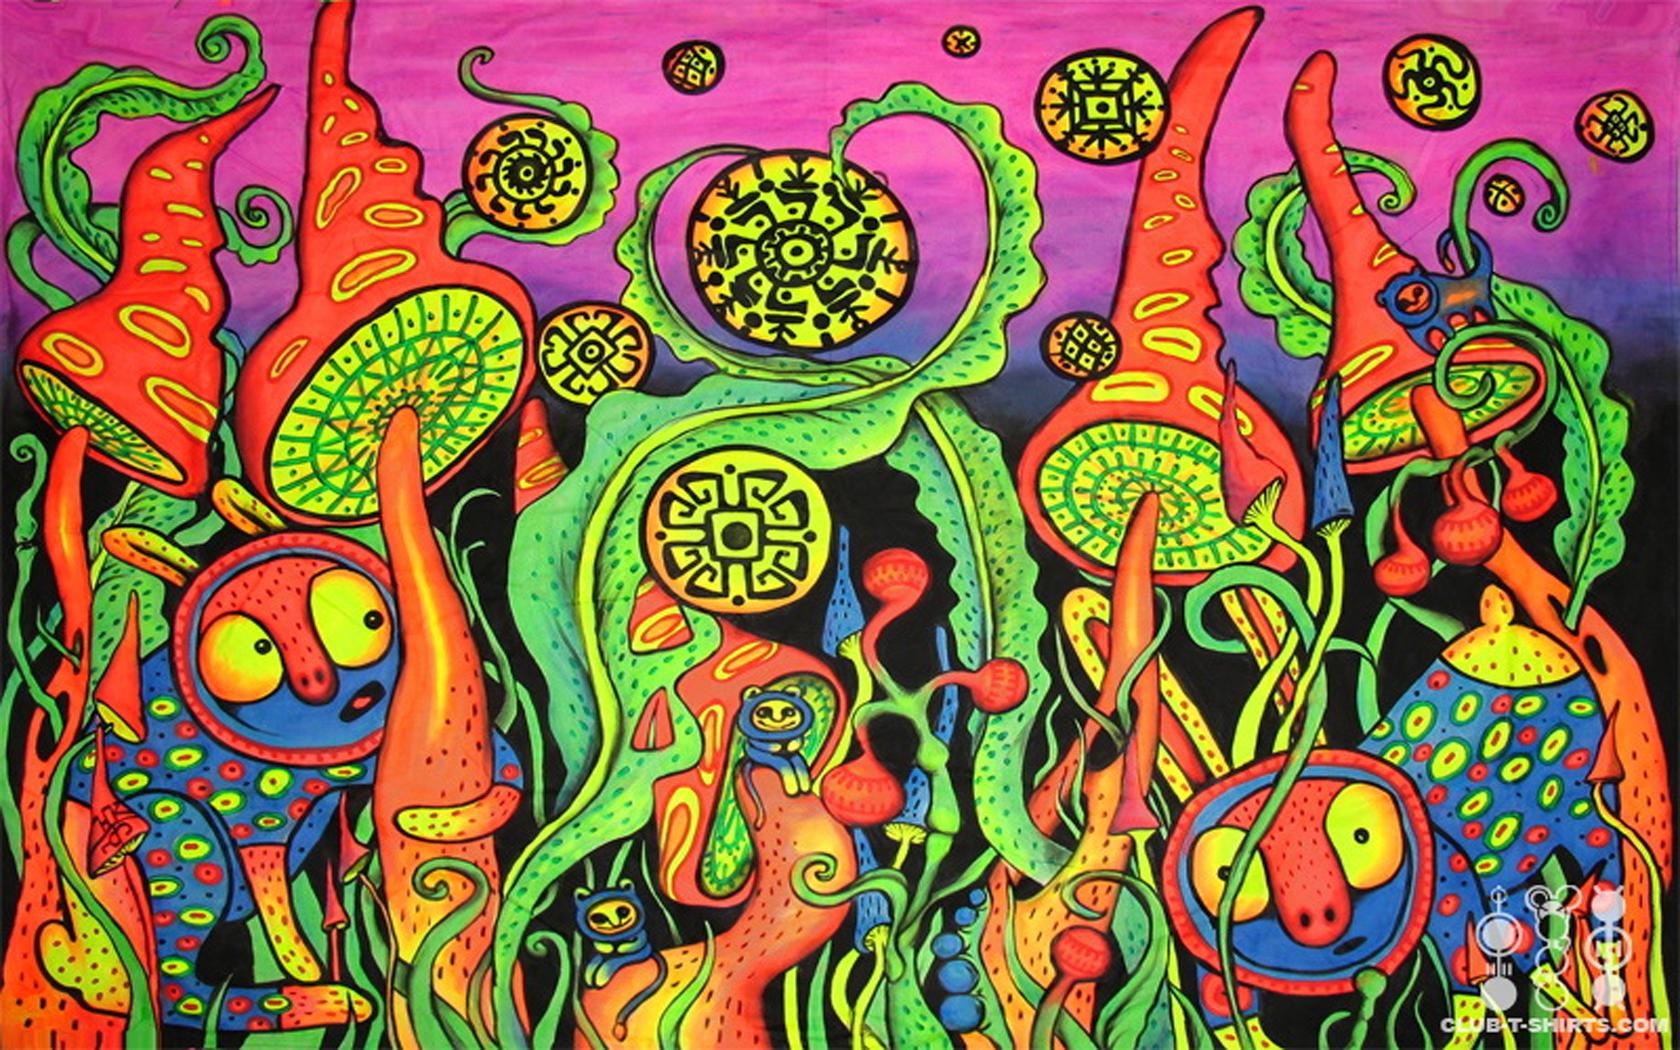 Magic Mushrooms = Hyper Connected Brain | The Hat of Foil